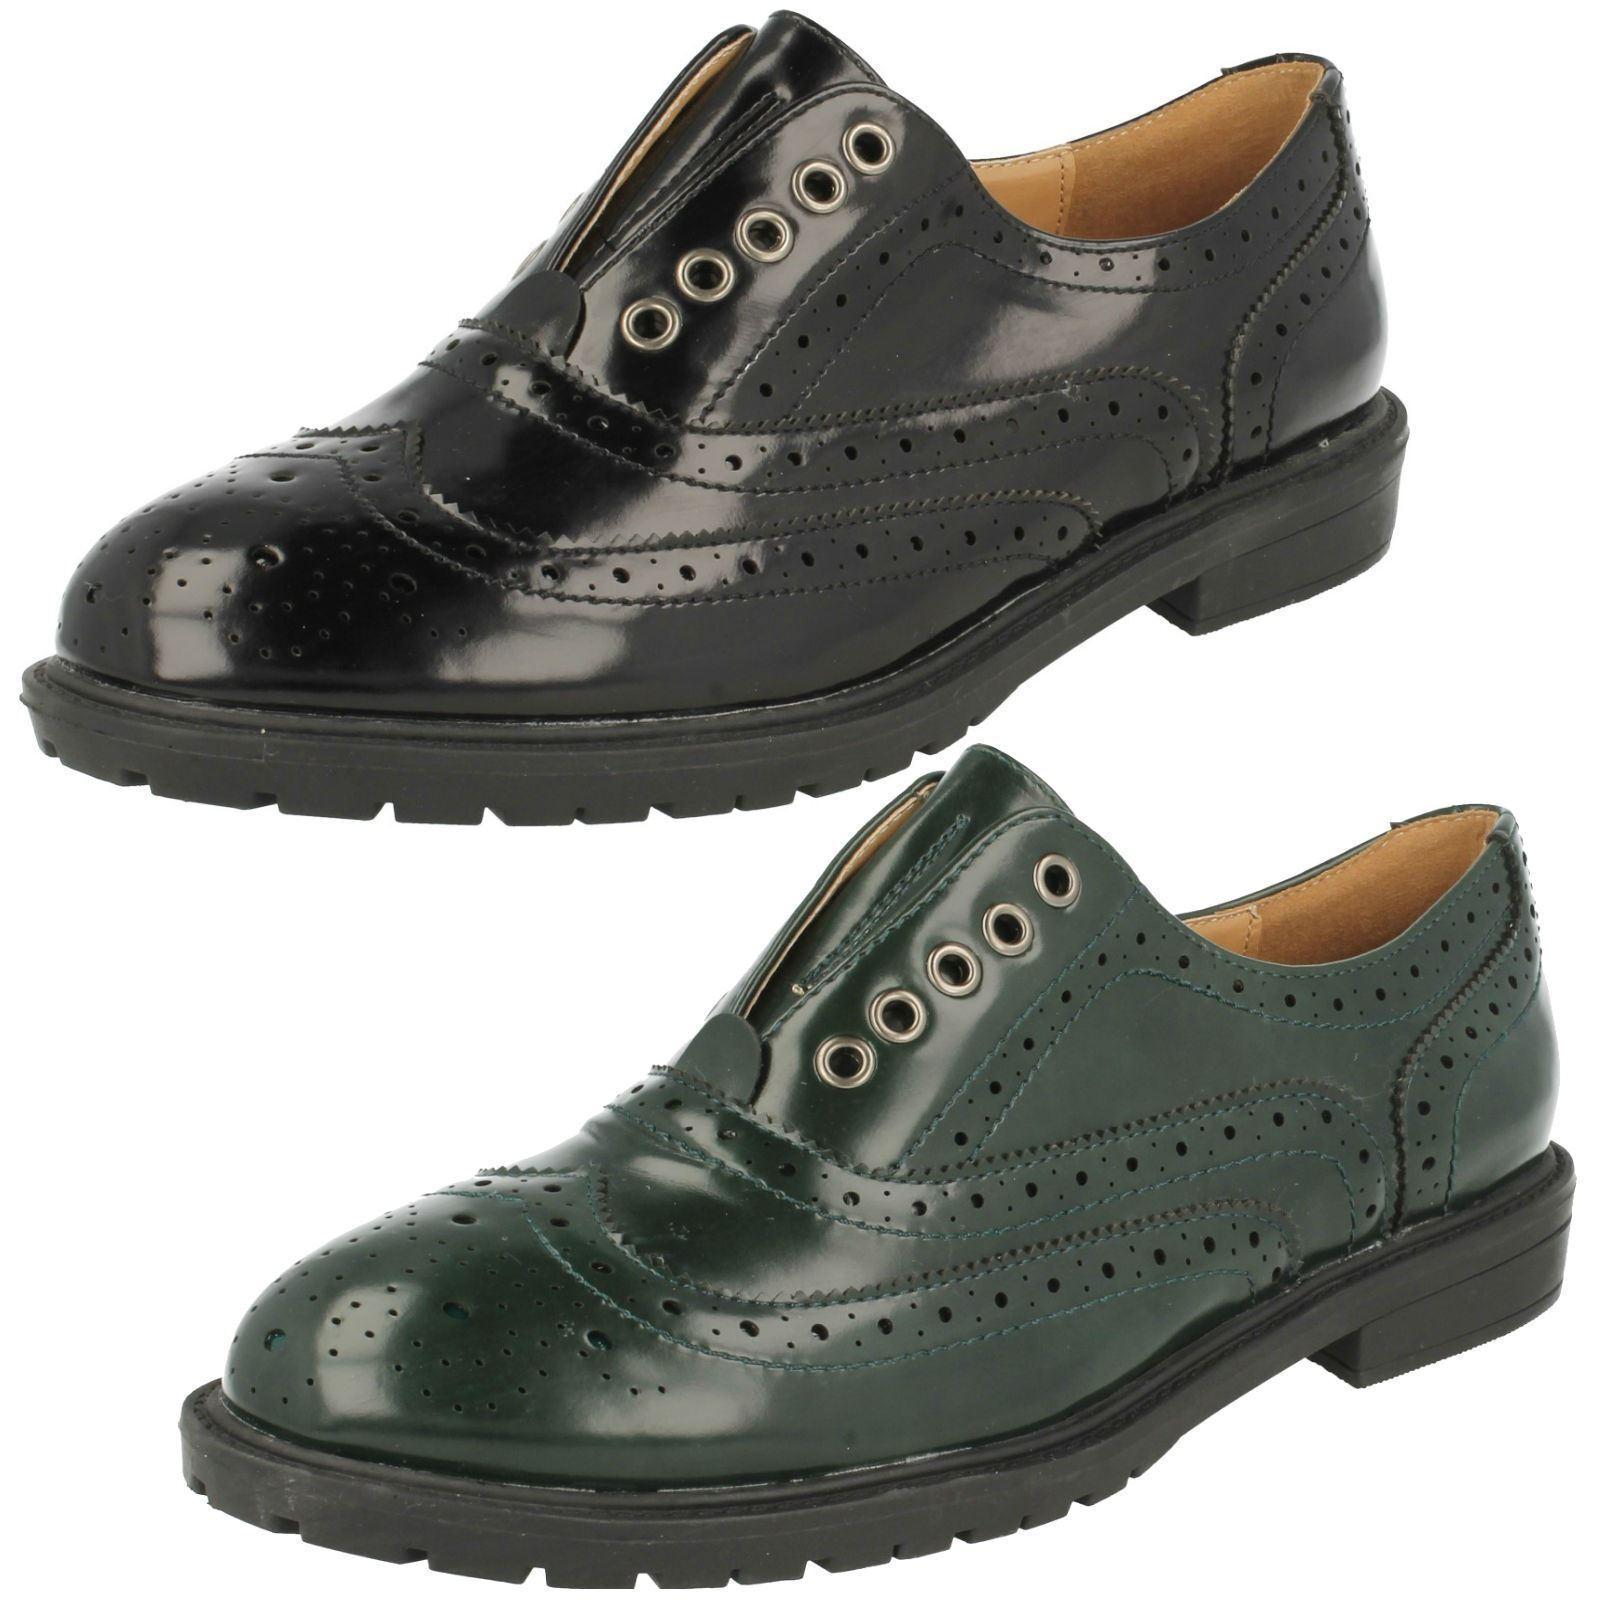 Mujer REBAJAS Spot On Zapato Oxford  zapatos  Estilo Estilo  f9869 9d022e